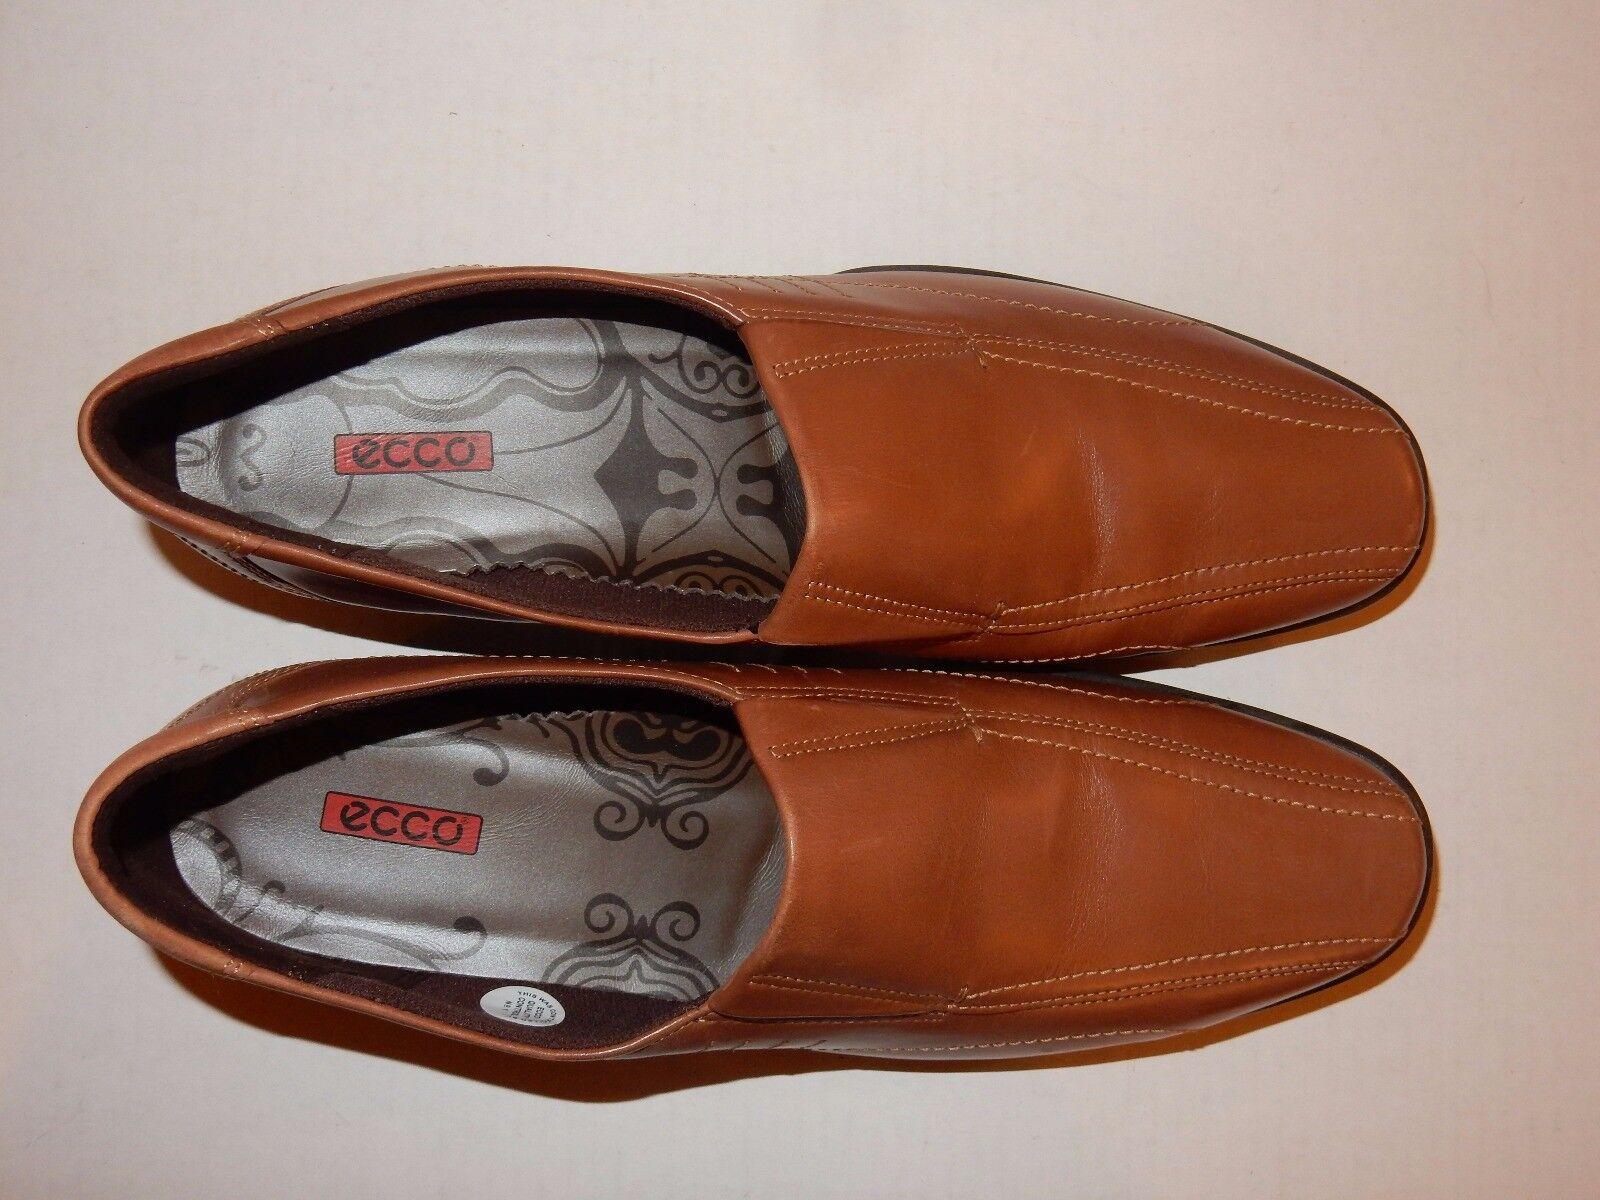 "NEW Ecco ""Shine"" Slip On On On Mahogany  Leder Loafers w Wedge Heel EU 42 11-11.5 US 3ef7fb"